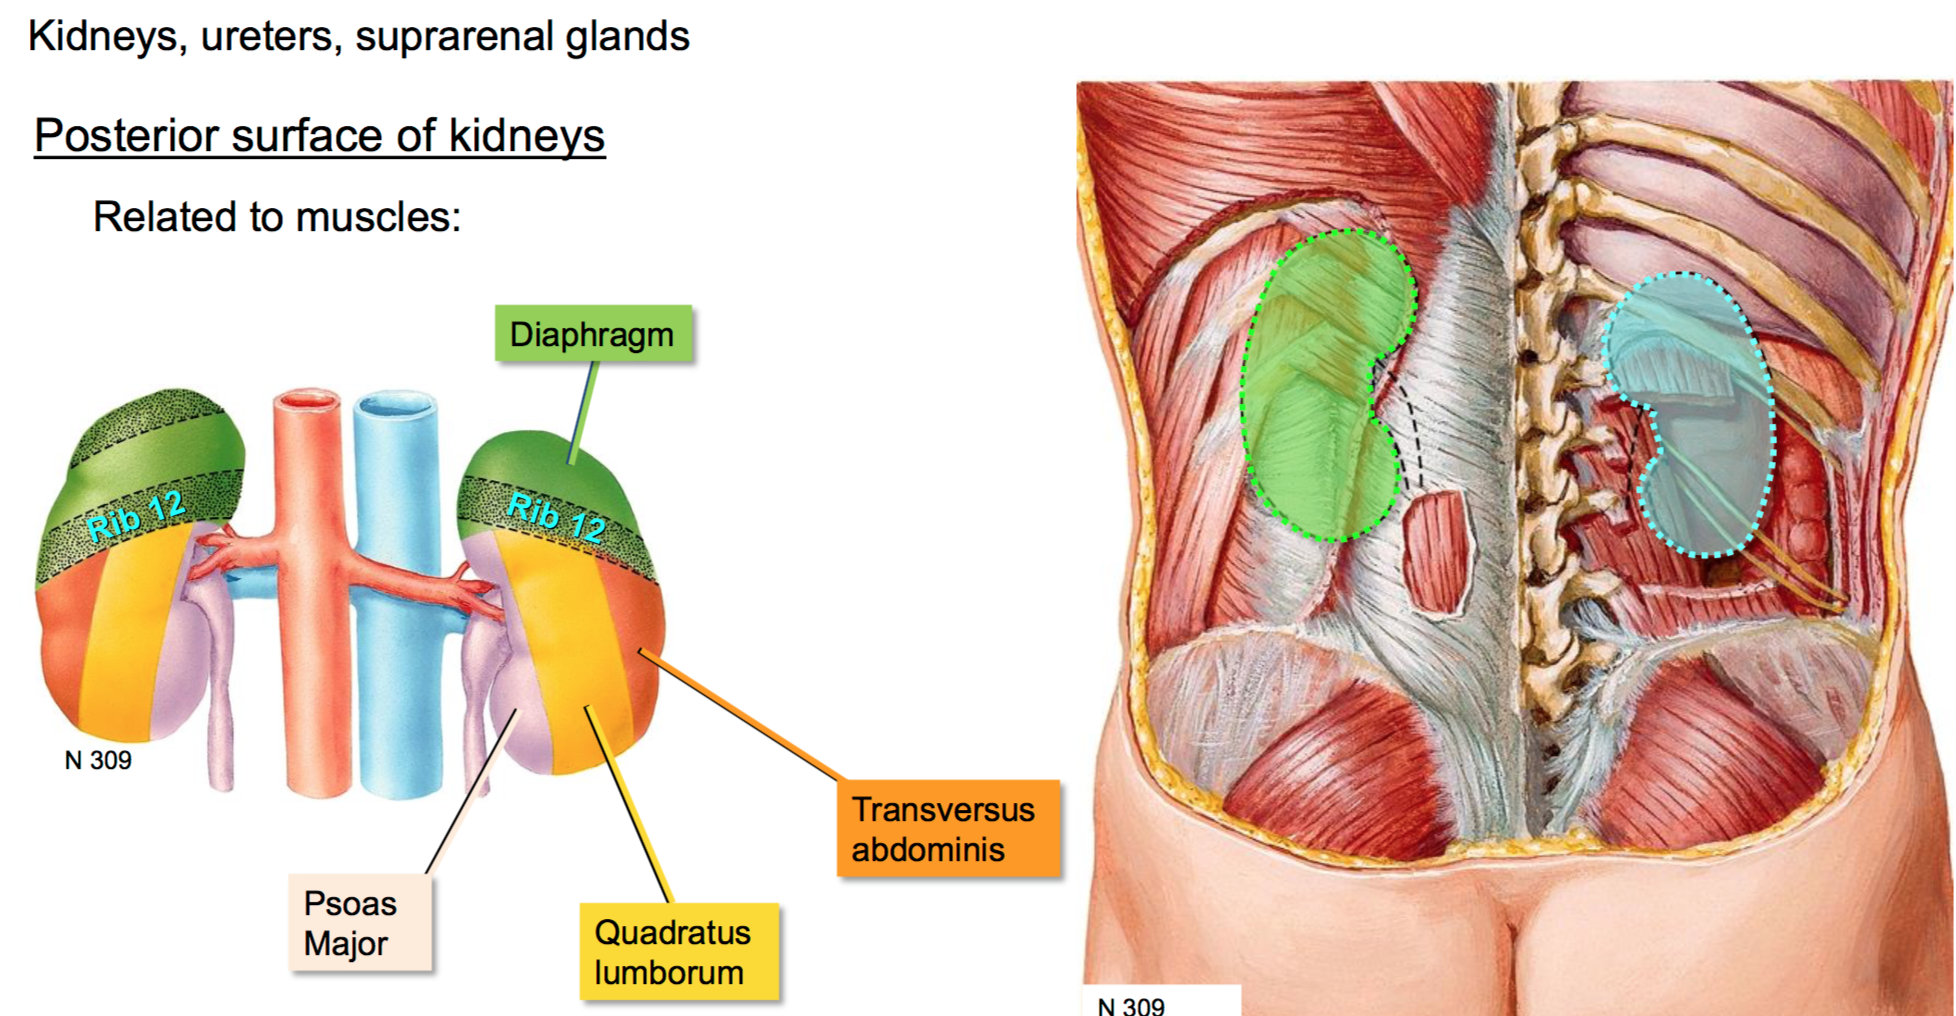 Colorful Quadratus Lumborum Anatomy Image - Physiology Of Human Body ...